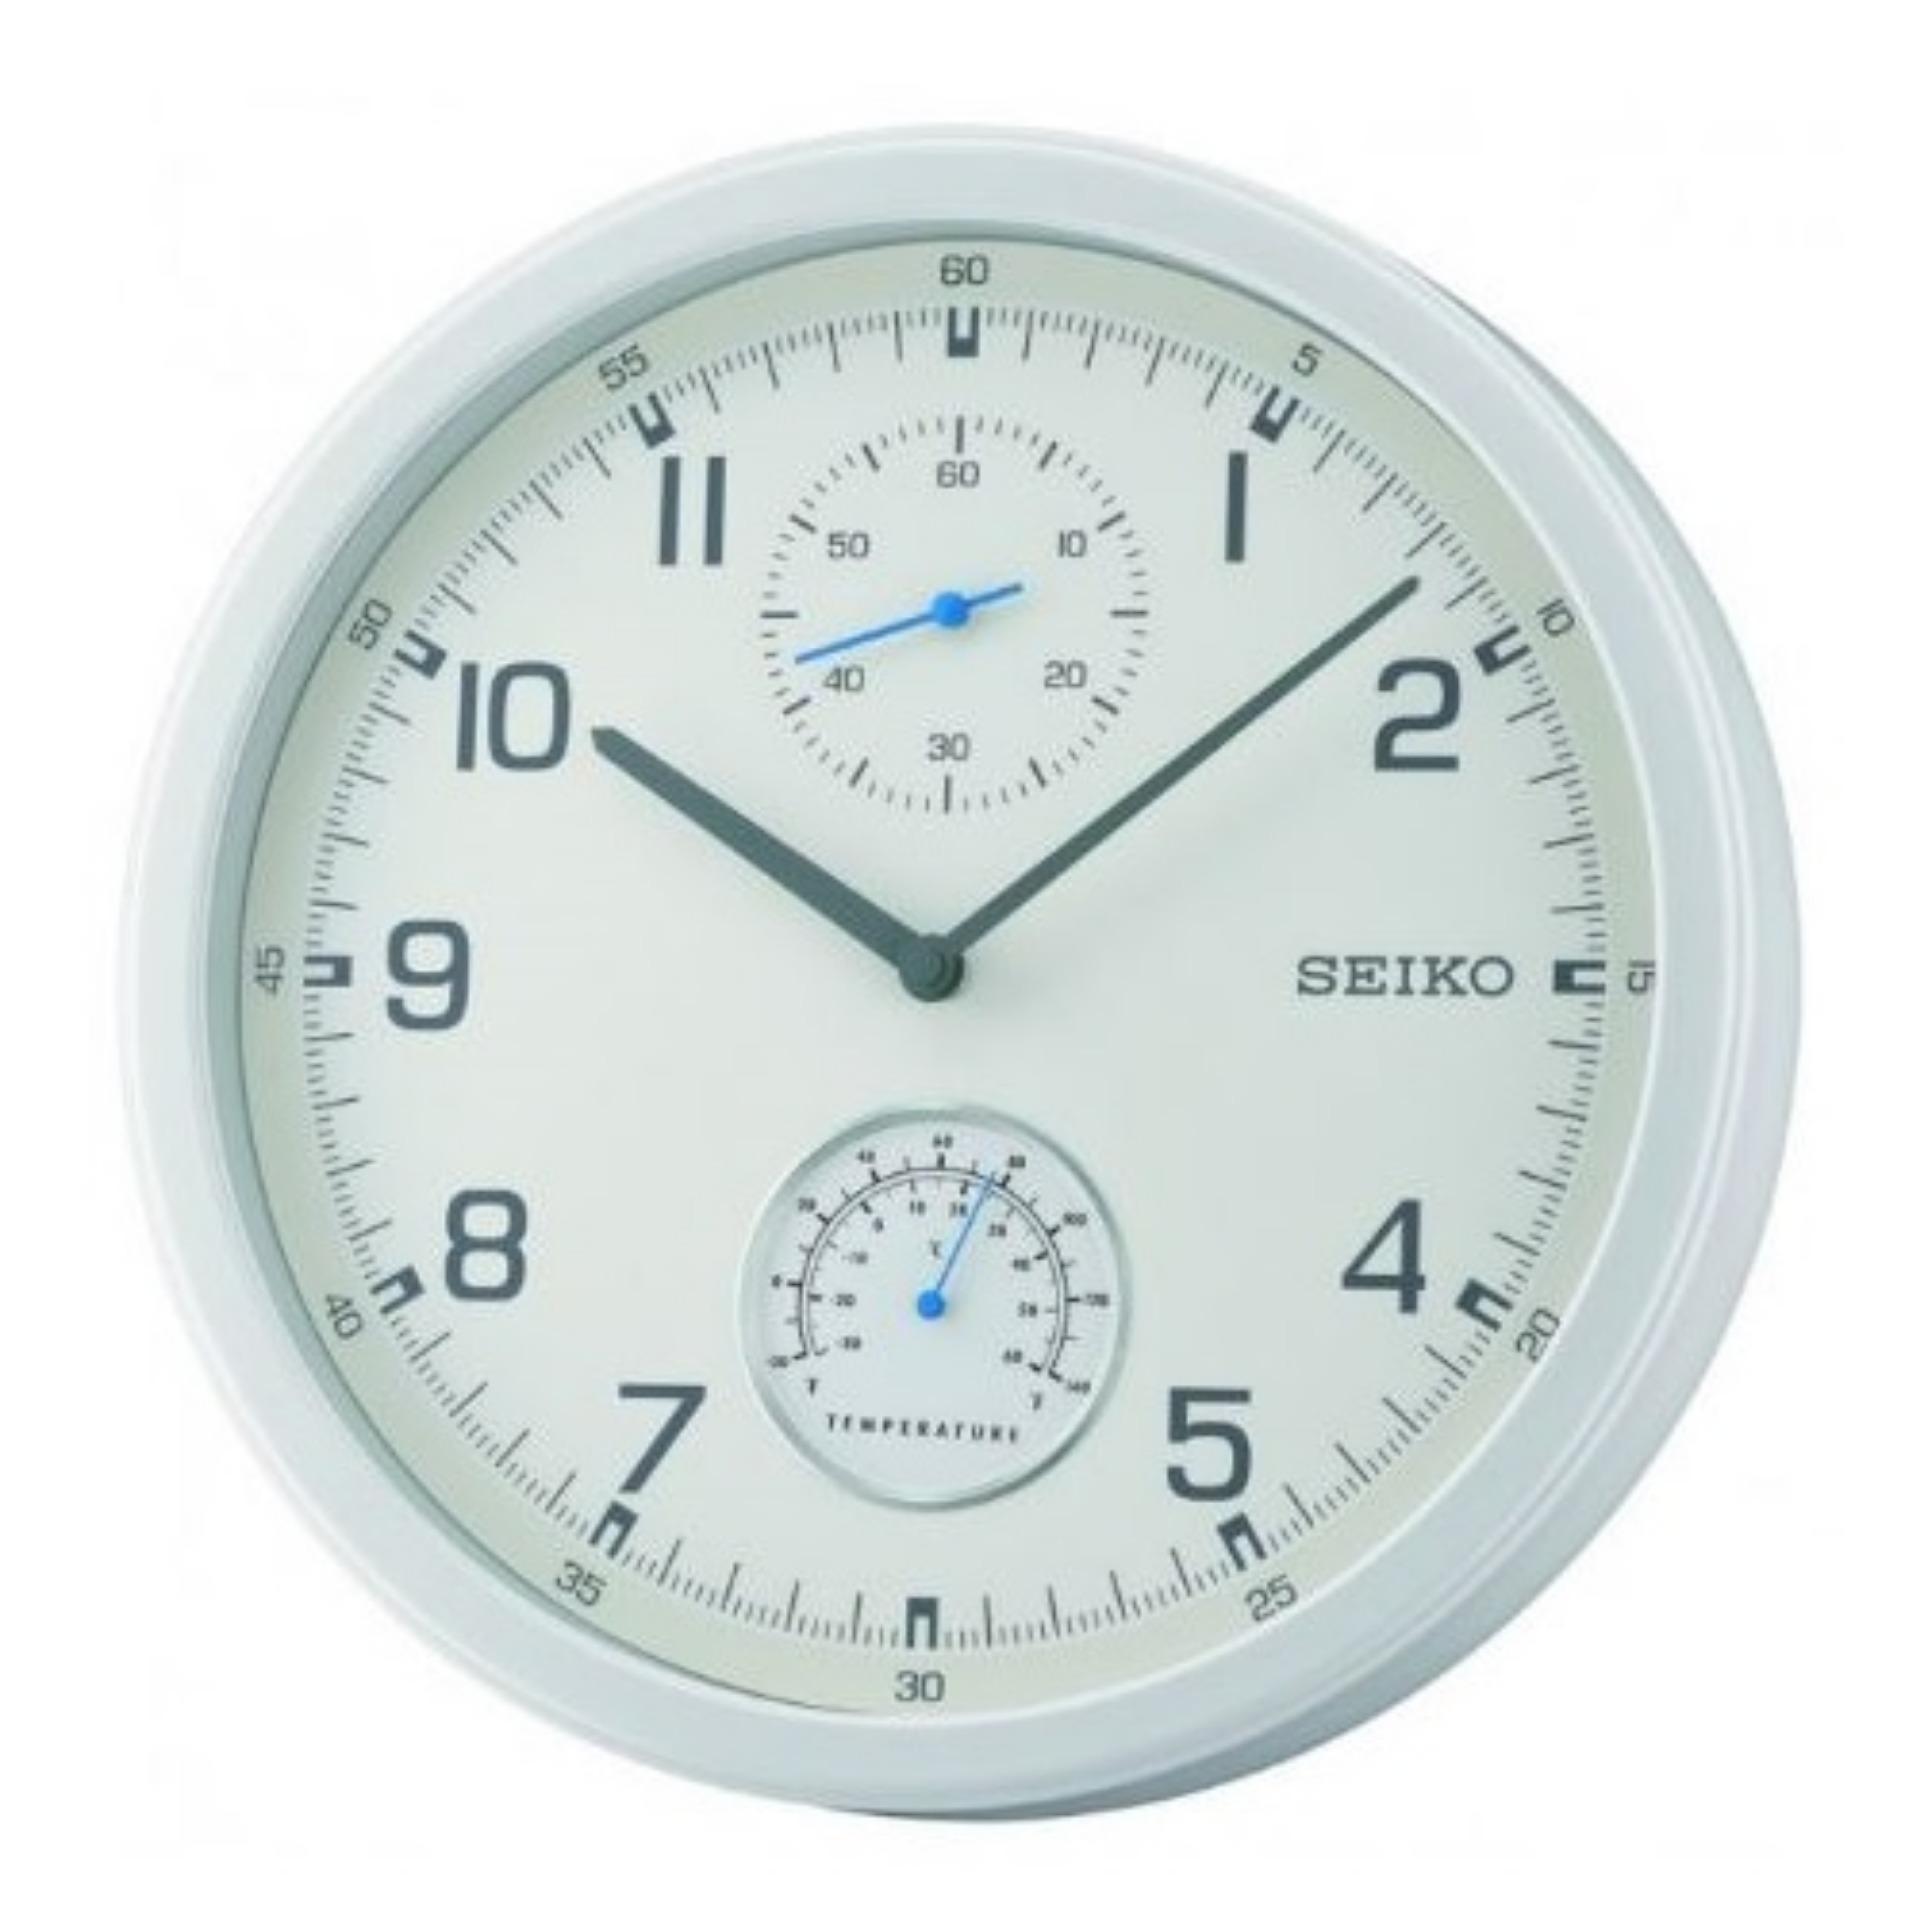 Seiko Qxa542w Analog Thermometer Wall Clock Singapore